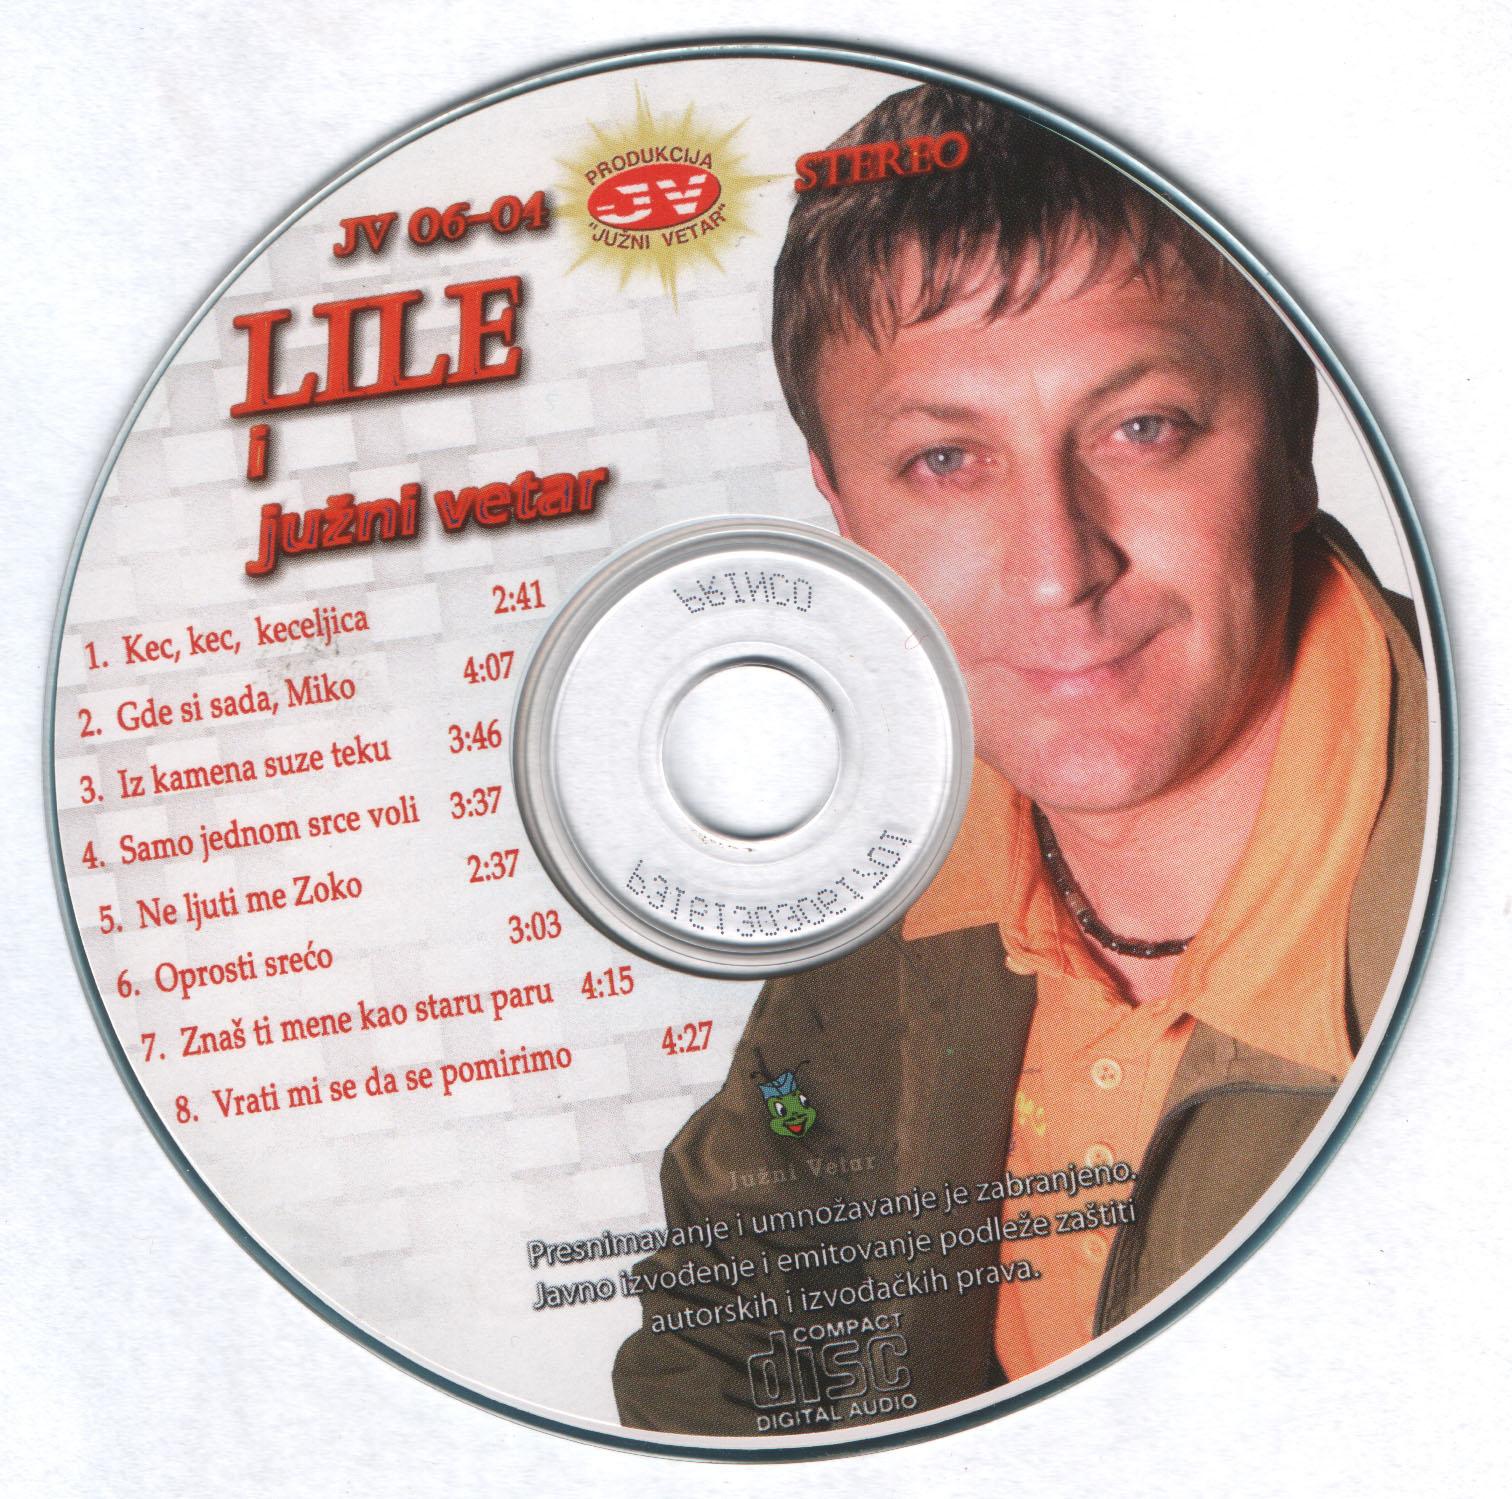 Lile 2006 Cd